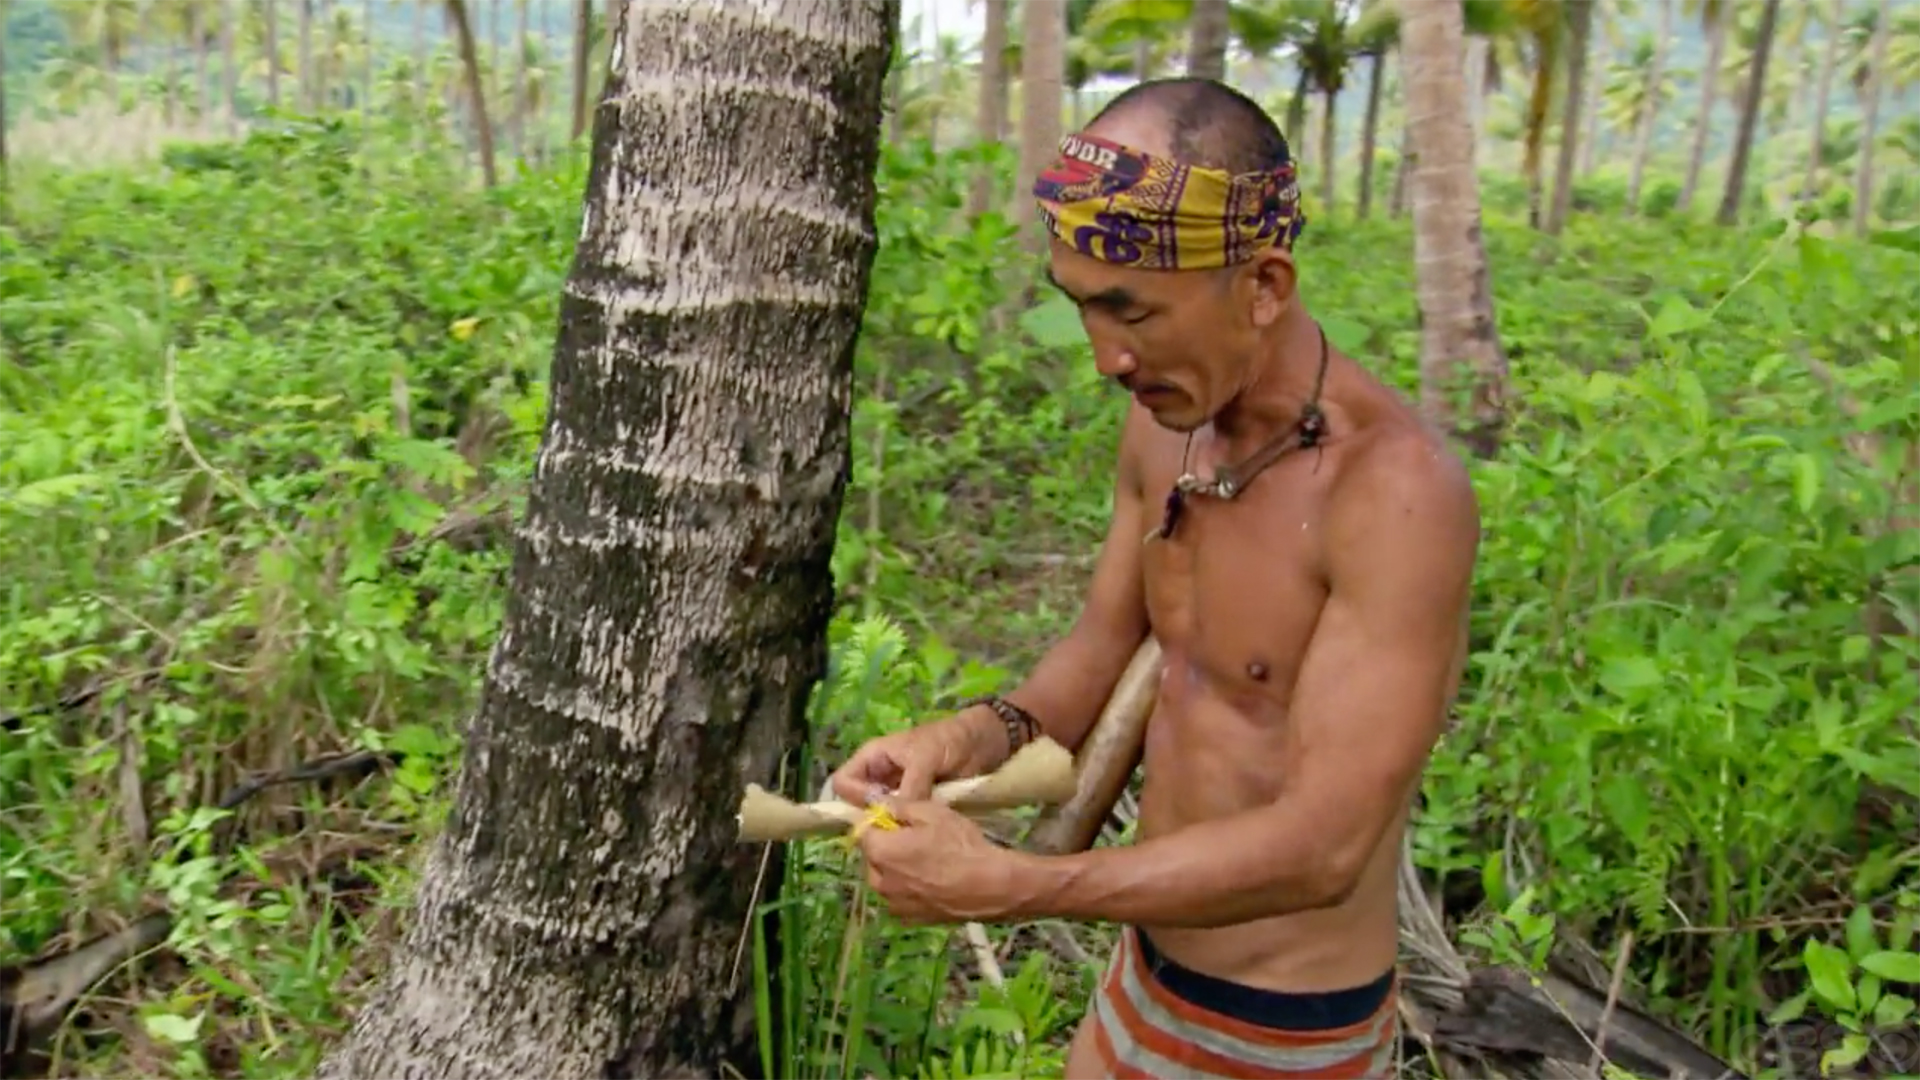 Scot Pollard and Tai Trang's Immunity Idols from Survivor: Kaôh Rōng